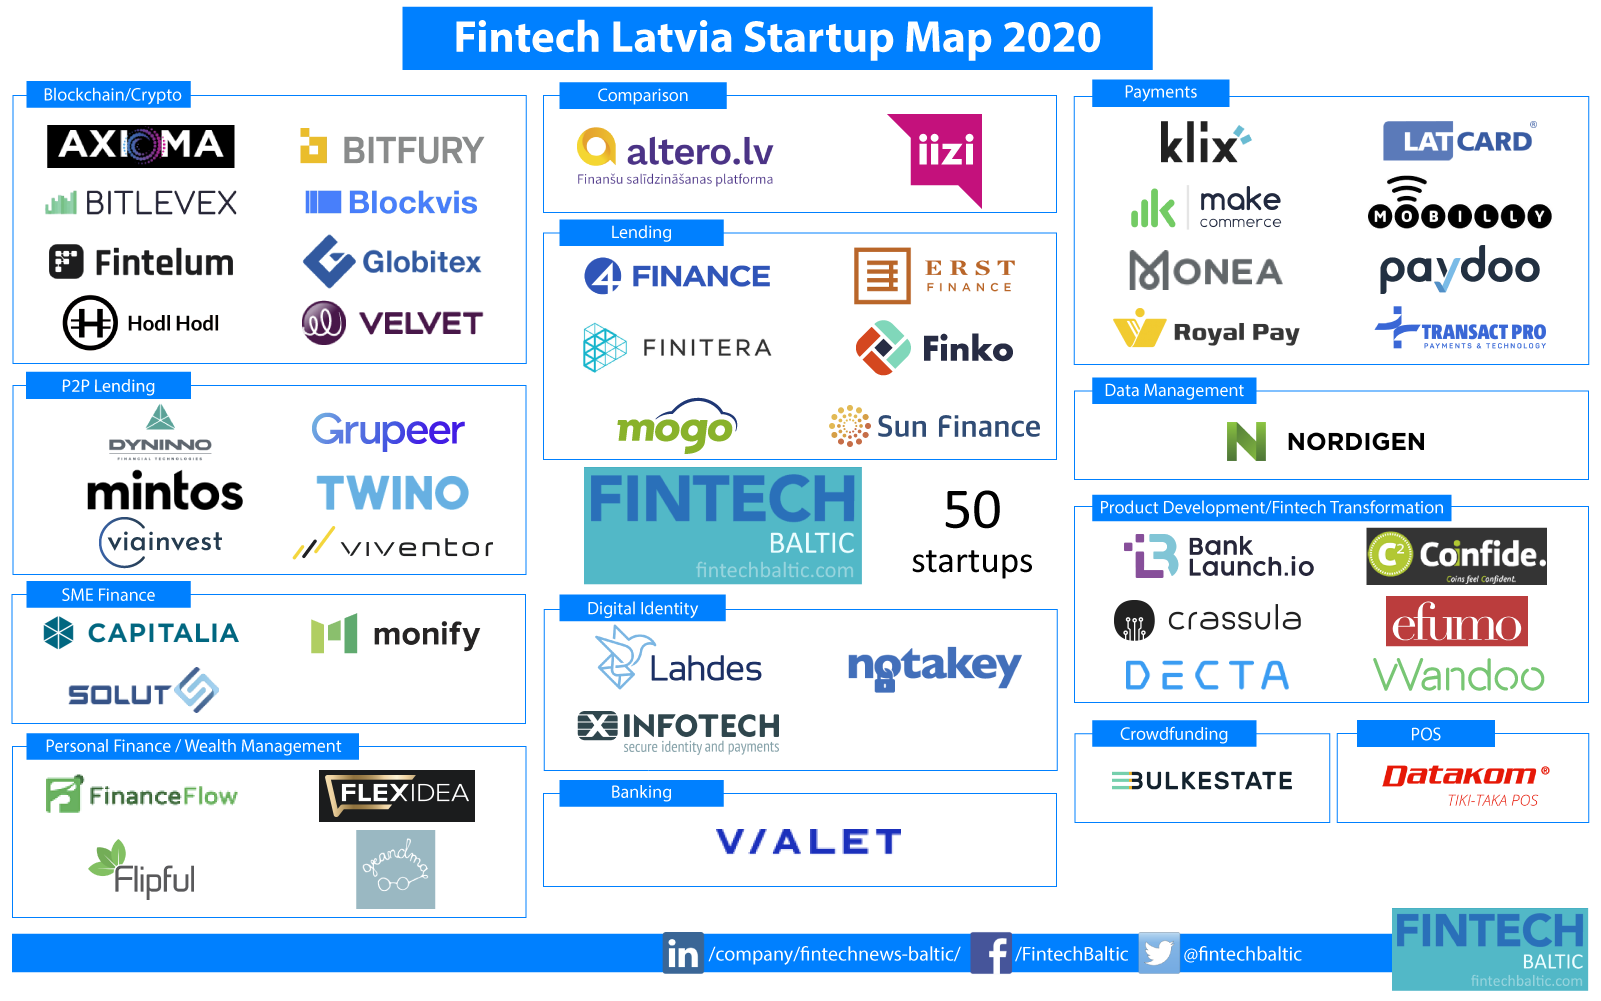 Latvia Fintech Startup Map